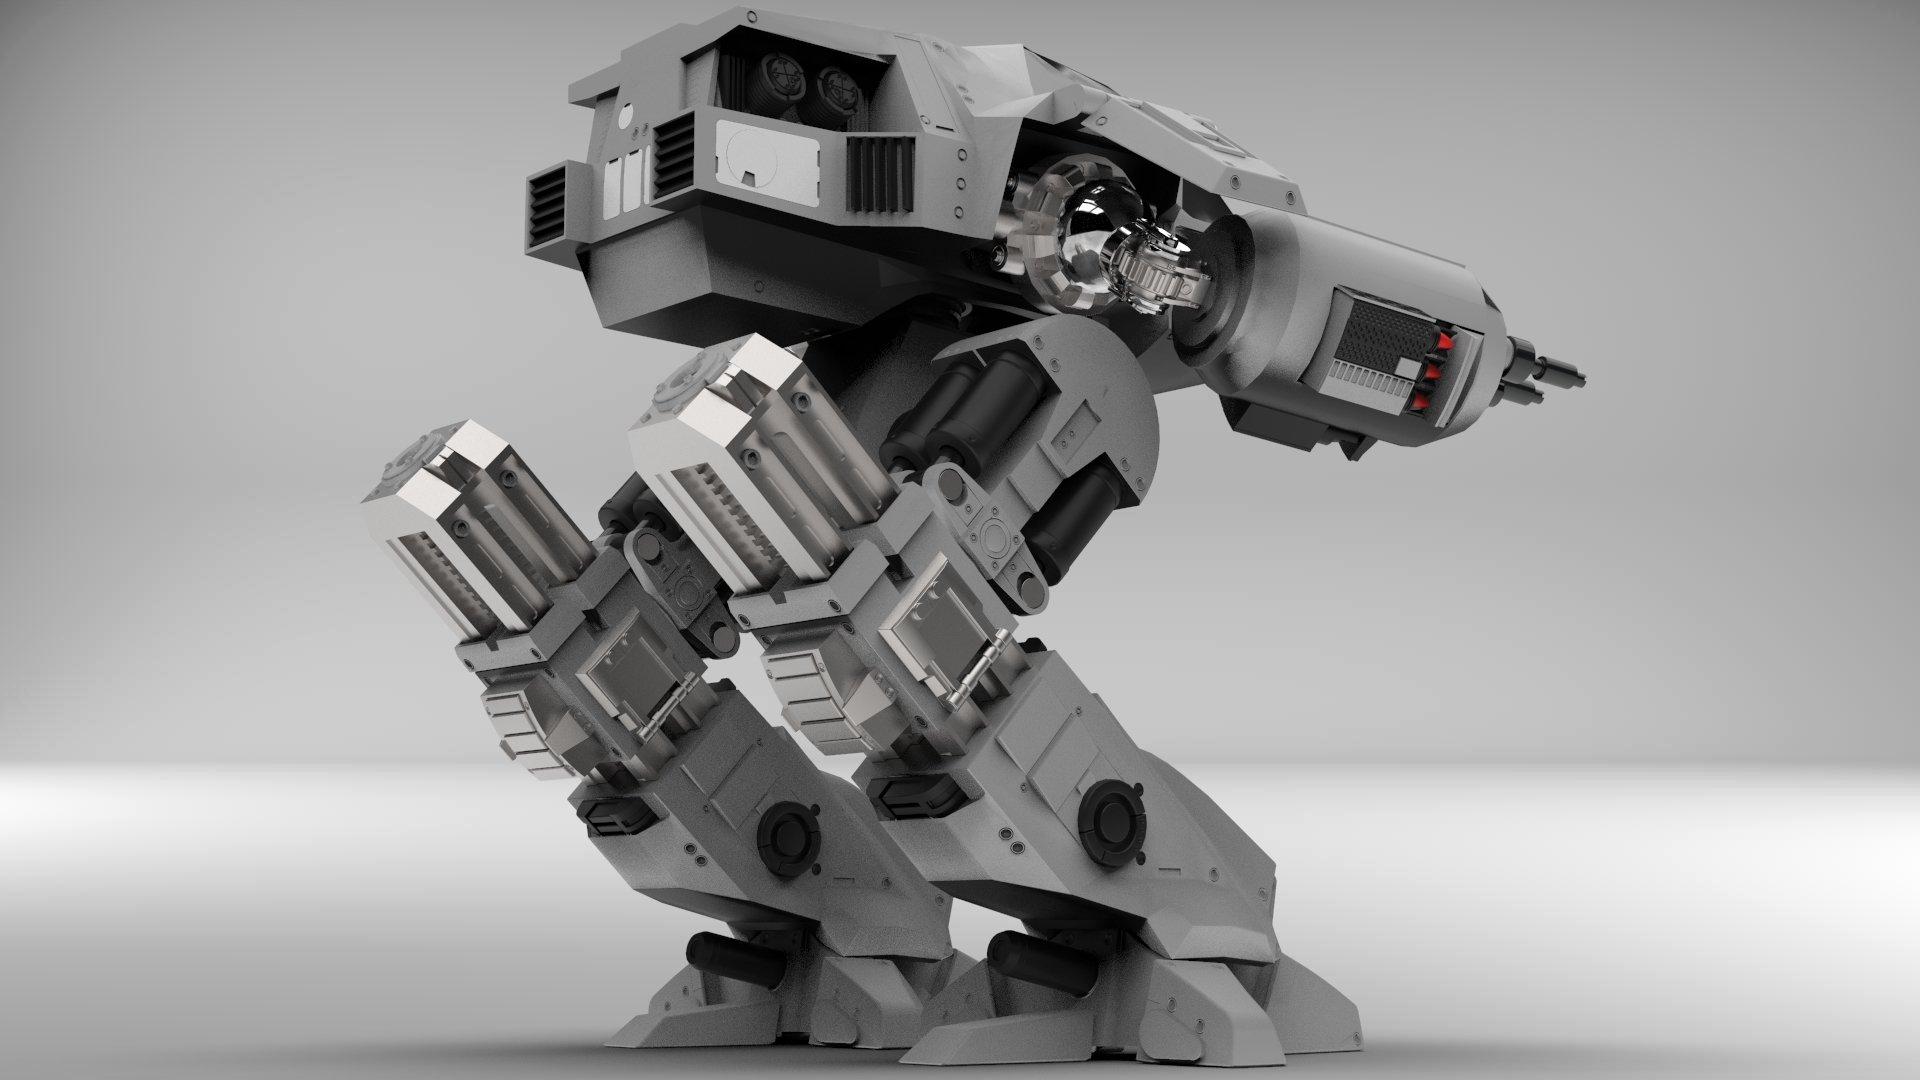 Robocop's ED209 Police Robot